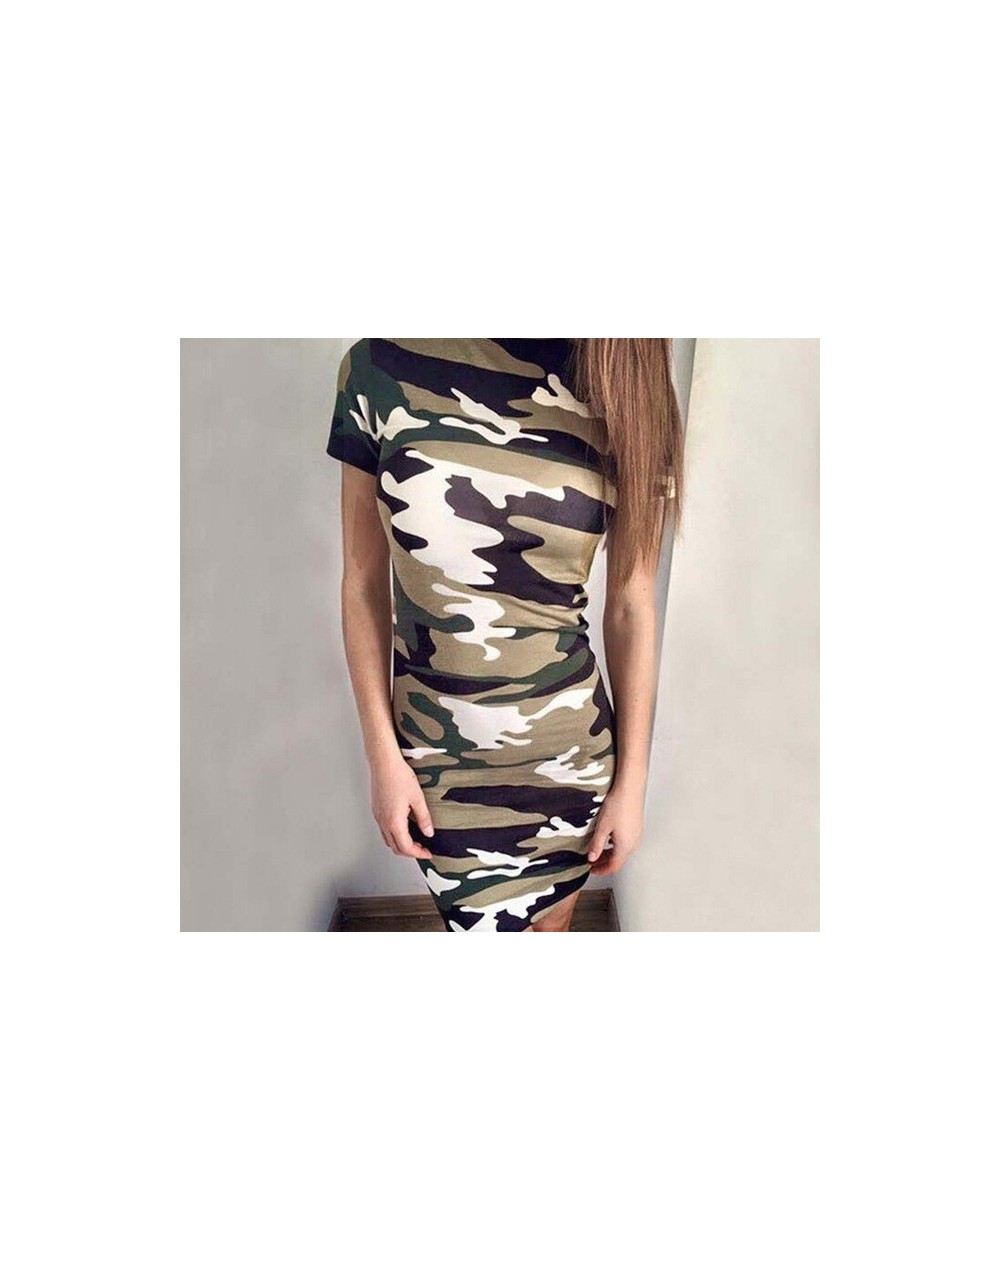 Women Cartoon Print Casual Camouflage Dress Sleeveless 2019 Summer New Slim Package Hip Dress Female Mini Dress Vestido Vera...